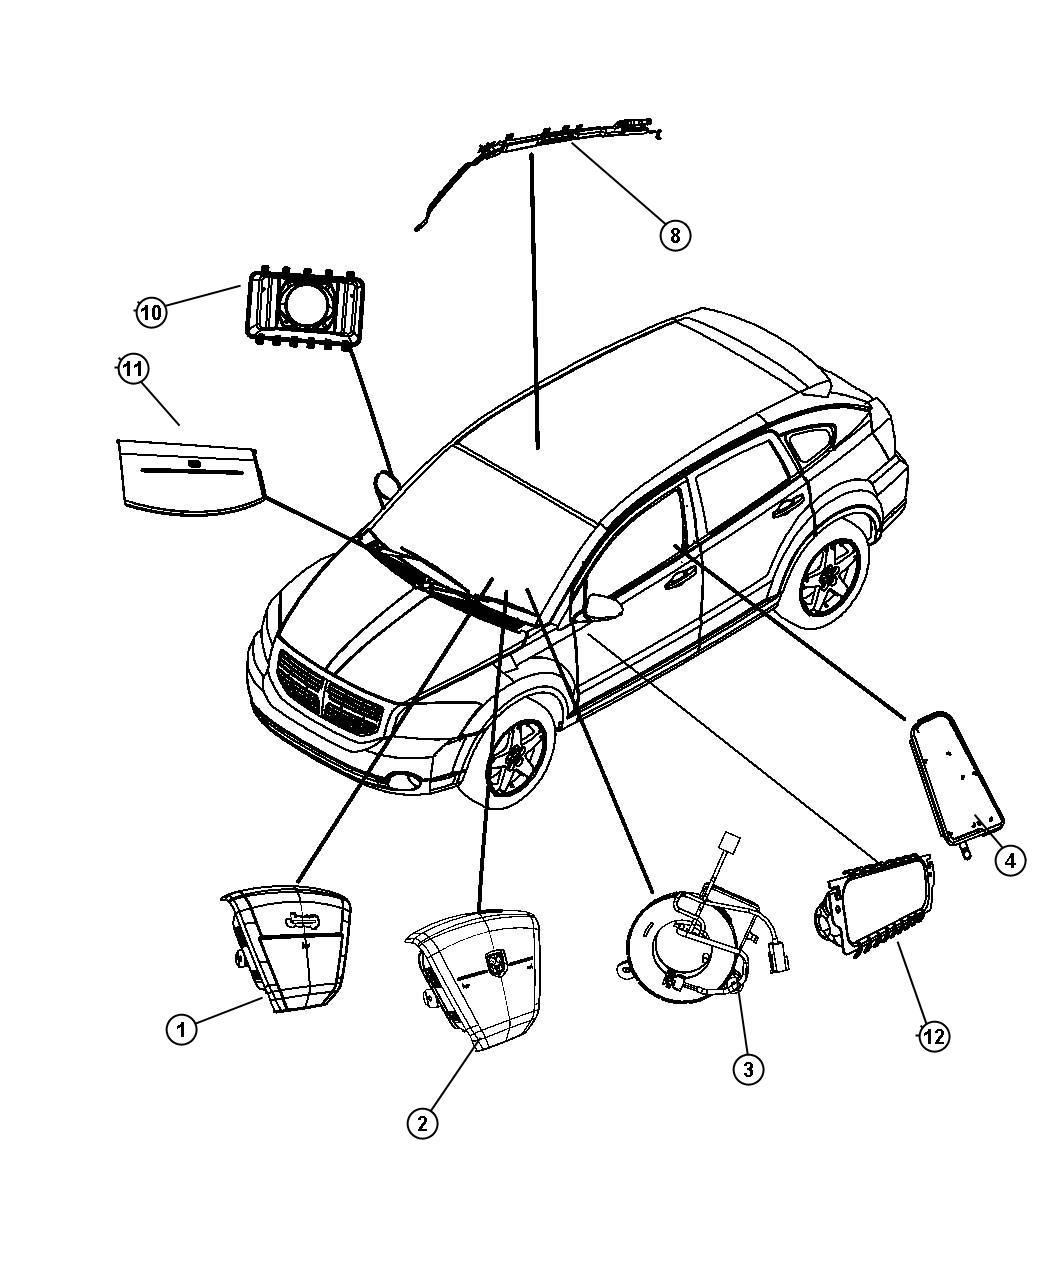 hight resolution of 2011 infiniti qx56 parts diagram infiniti auto wiring